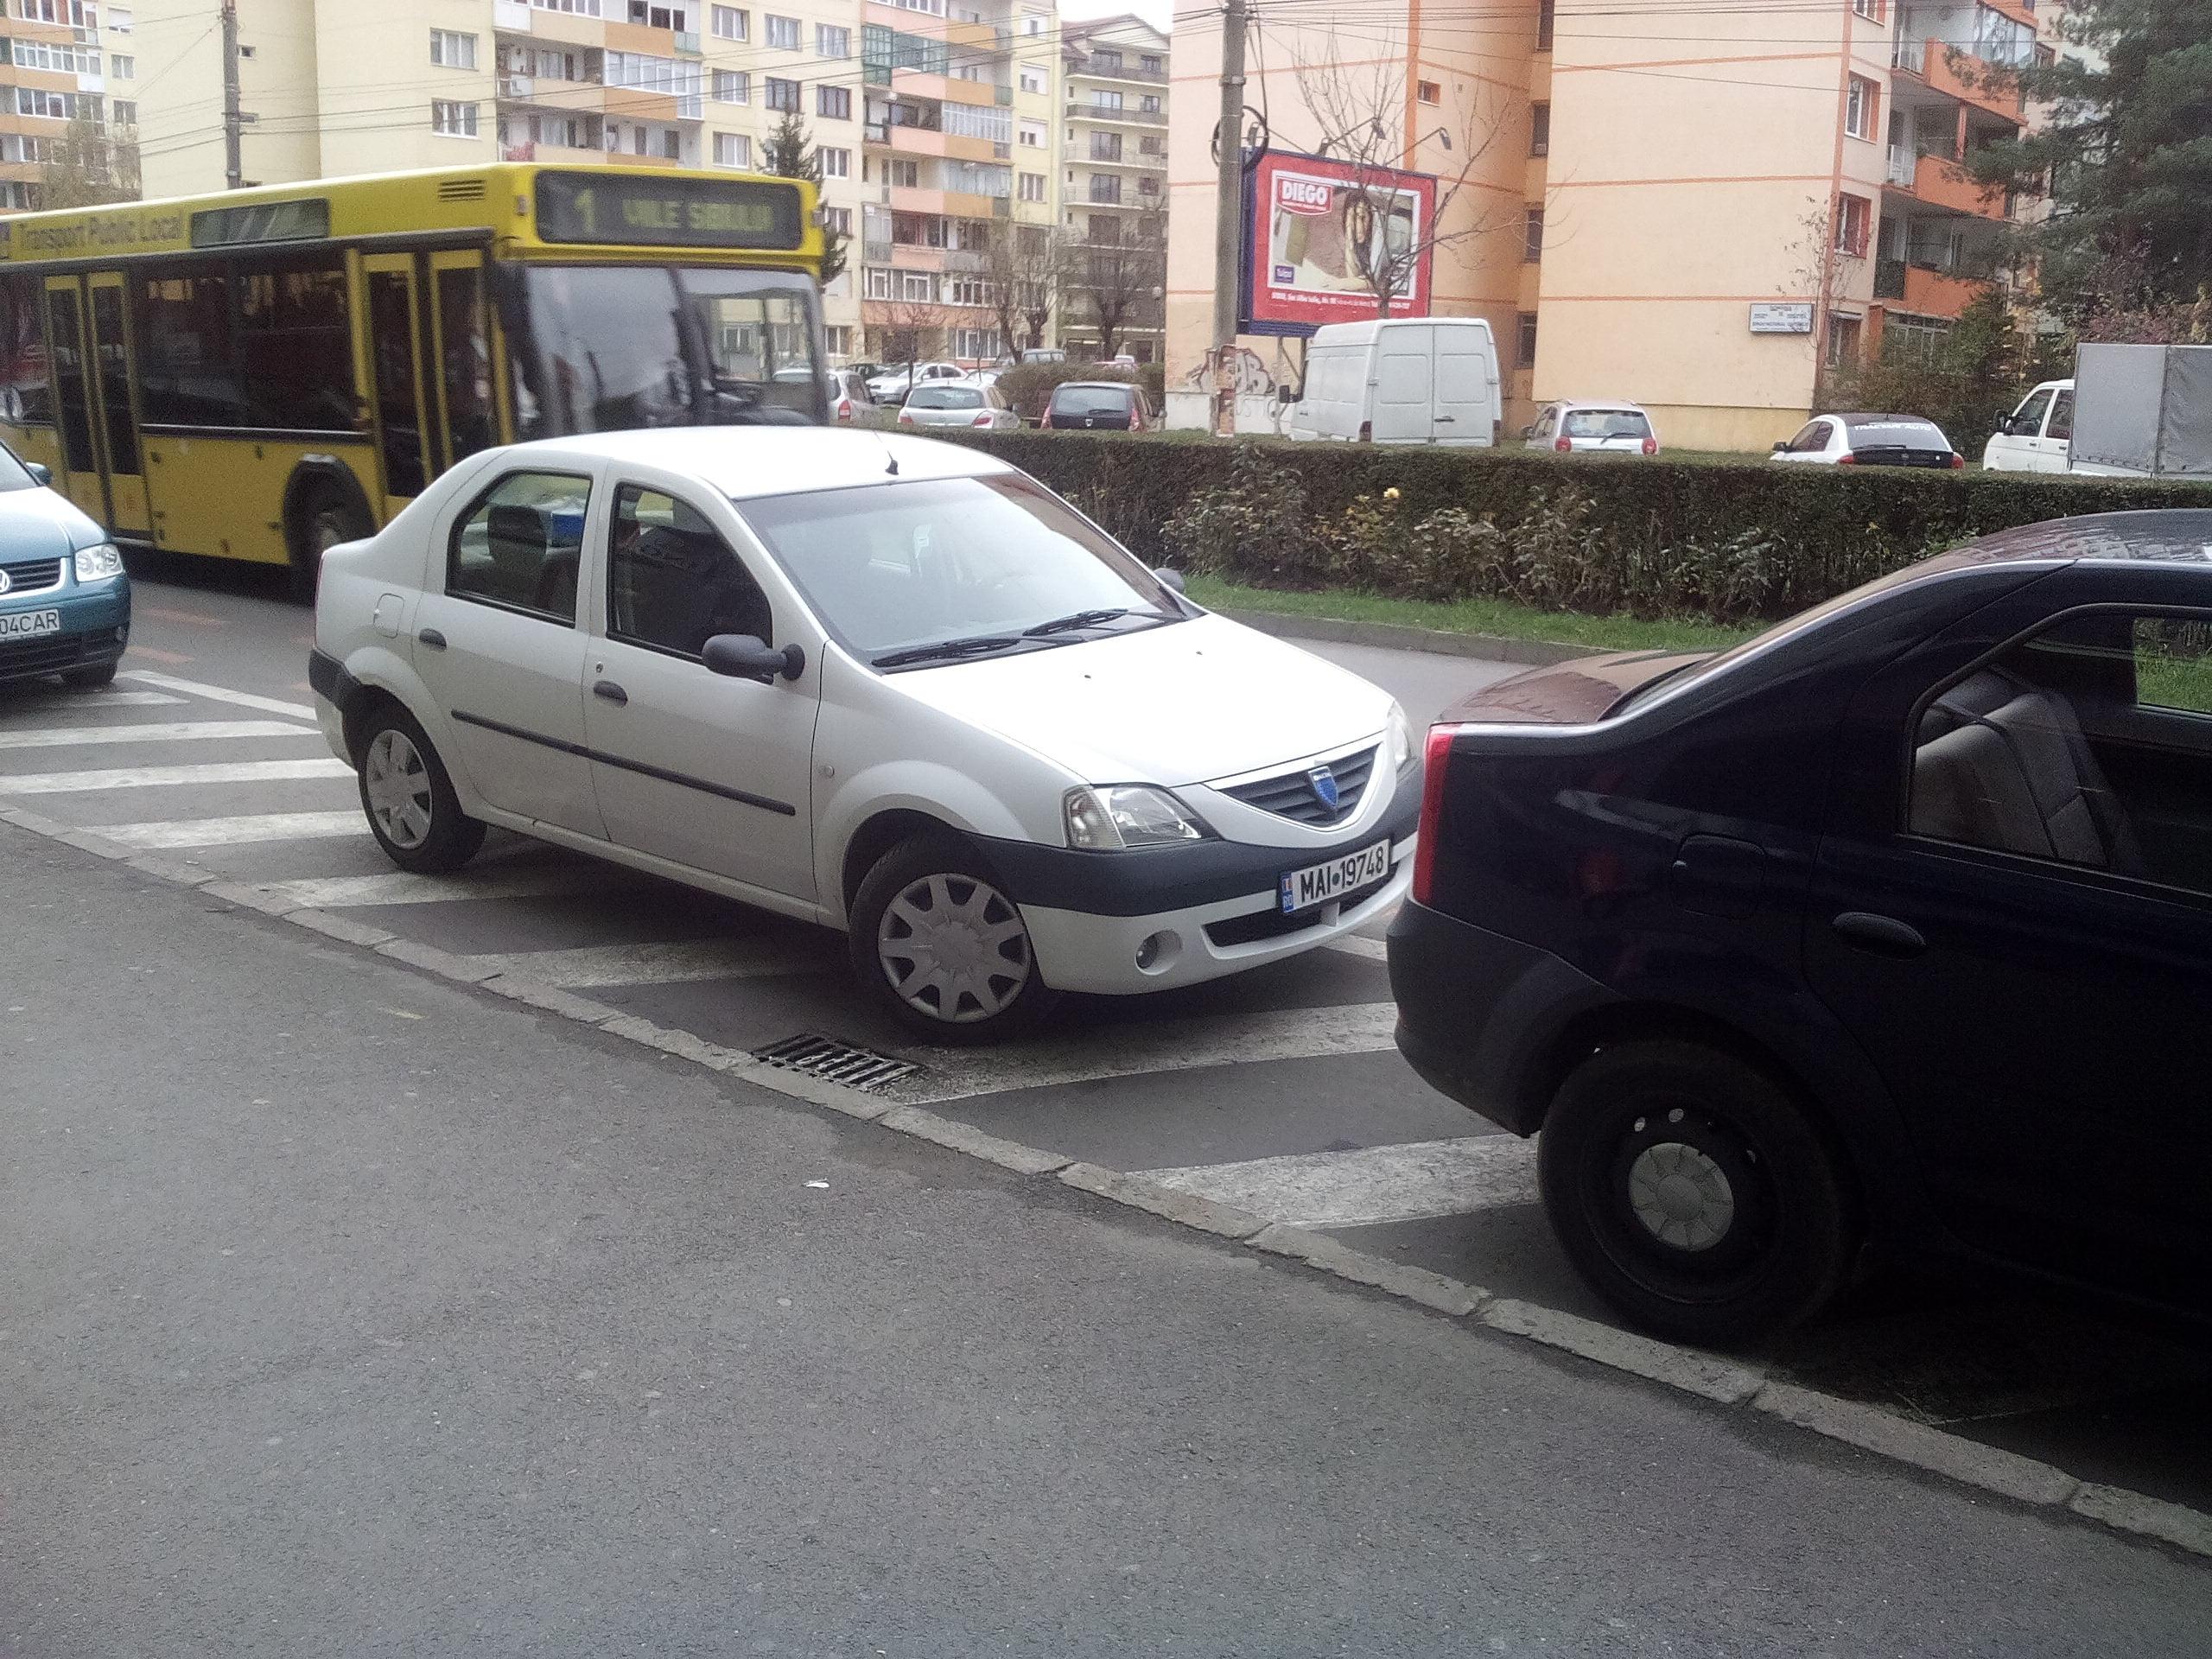 Politia si Politia Locala Sibiu, unite in nerespectrea regulilor